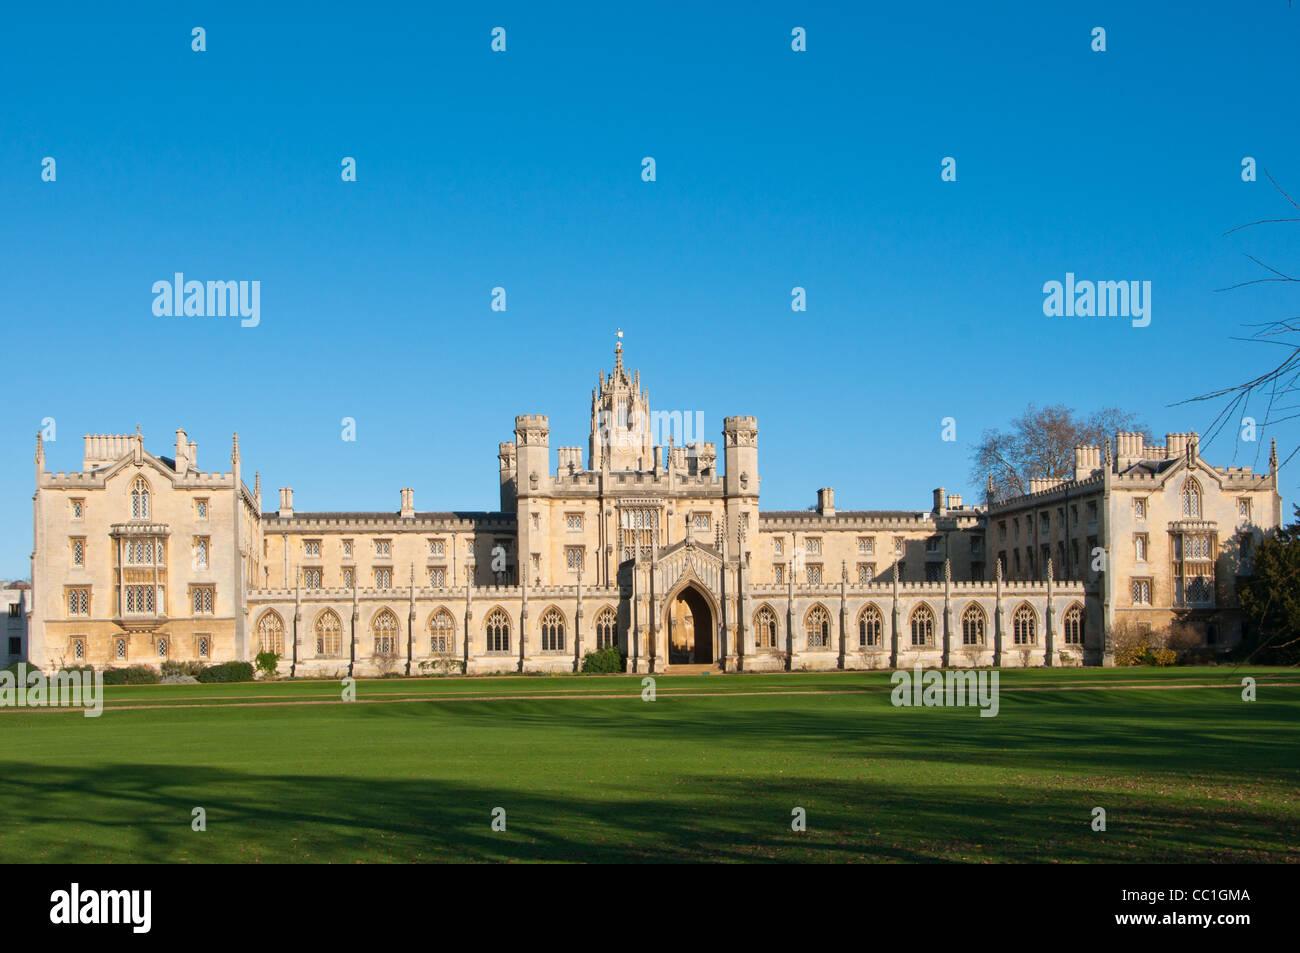 St John's College, Cambridge, UK - Stock Image